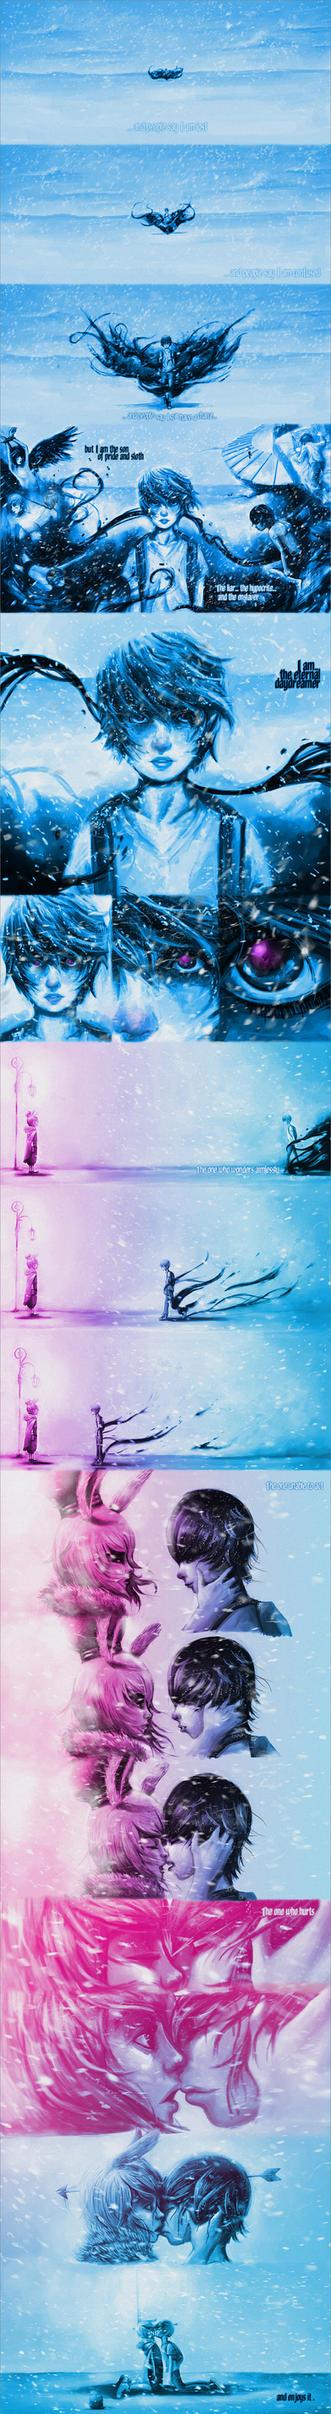 The Eternal Daydreamer by Xag